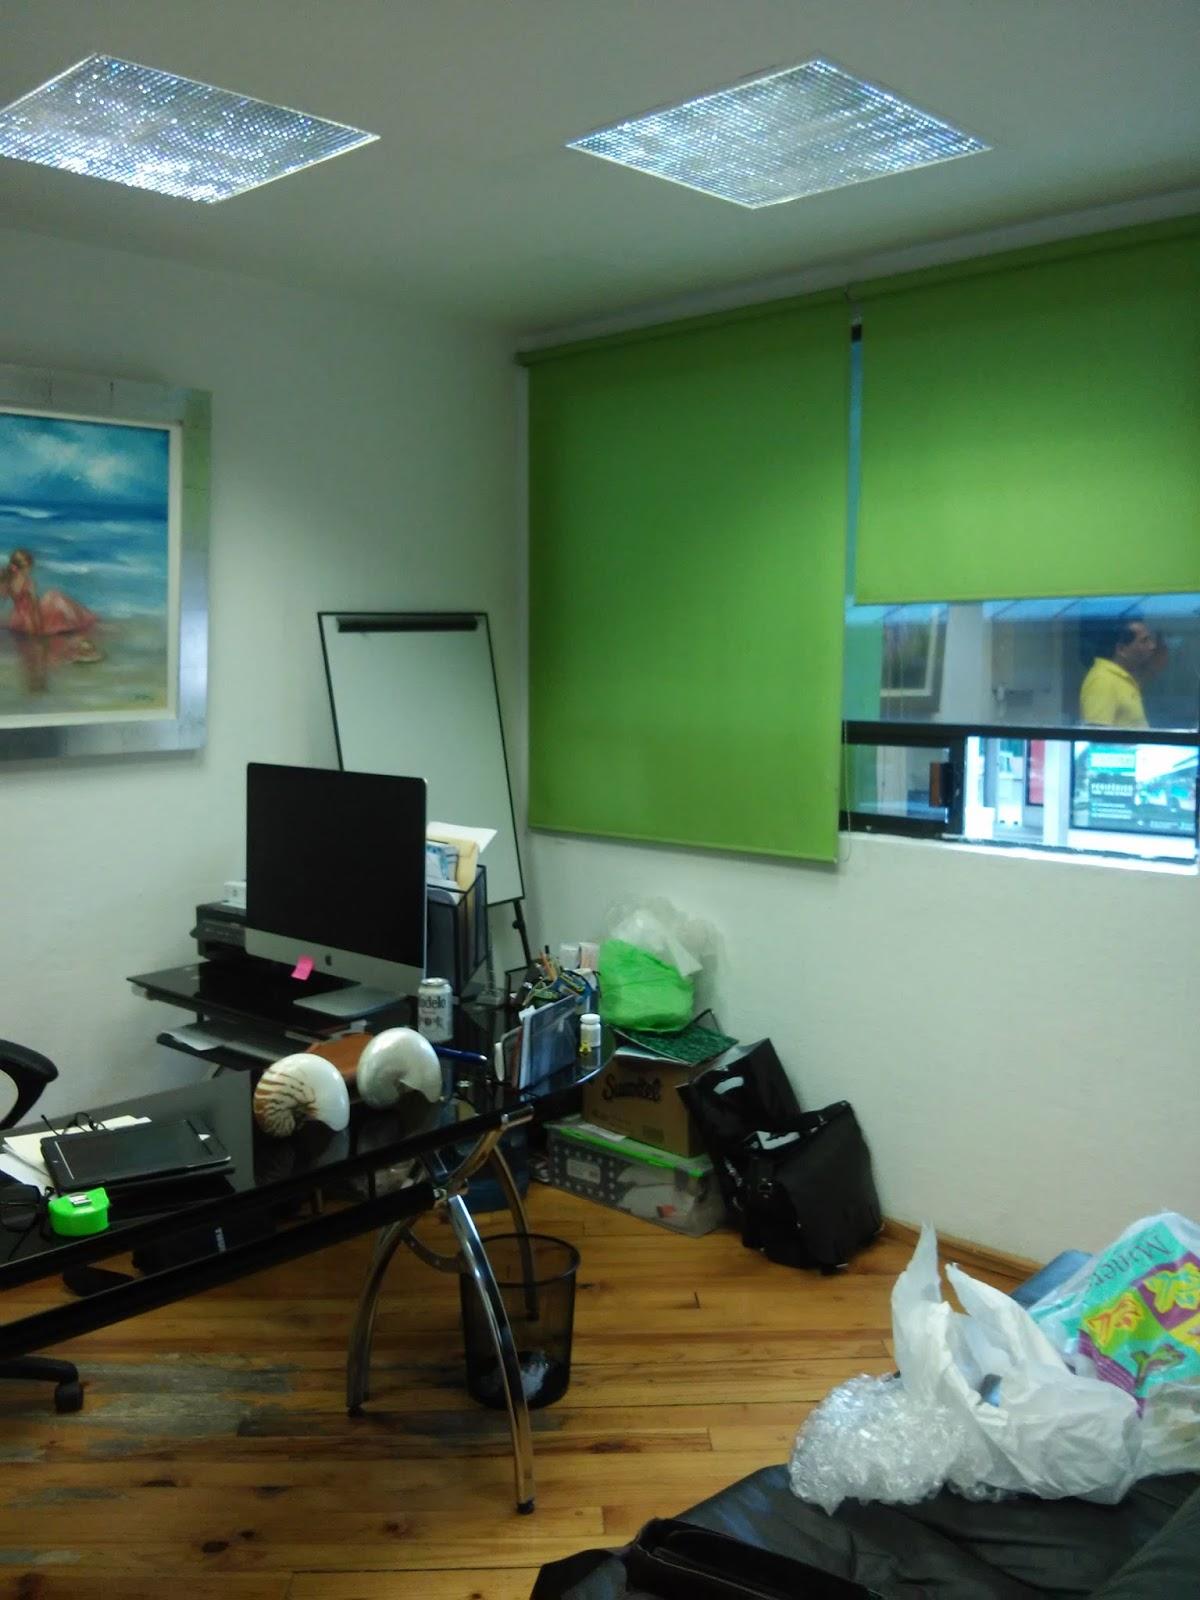 Despacho de arquitectos decoraci n de oficinas peque as for Decoracion de interiores para oficinas